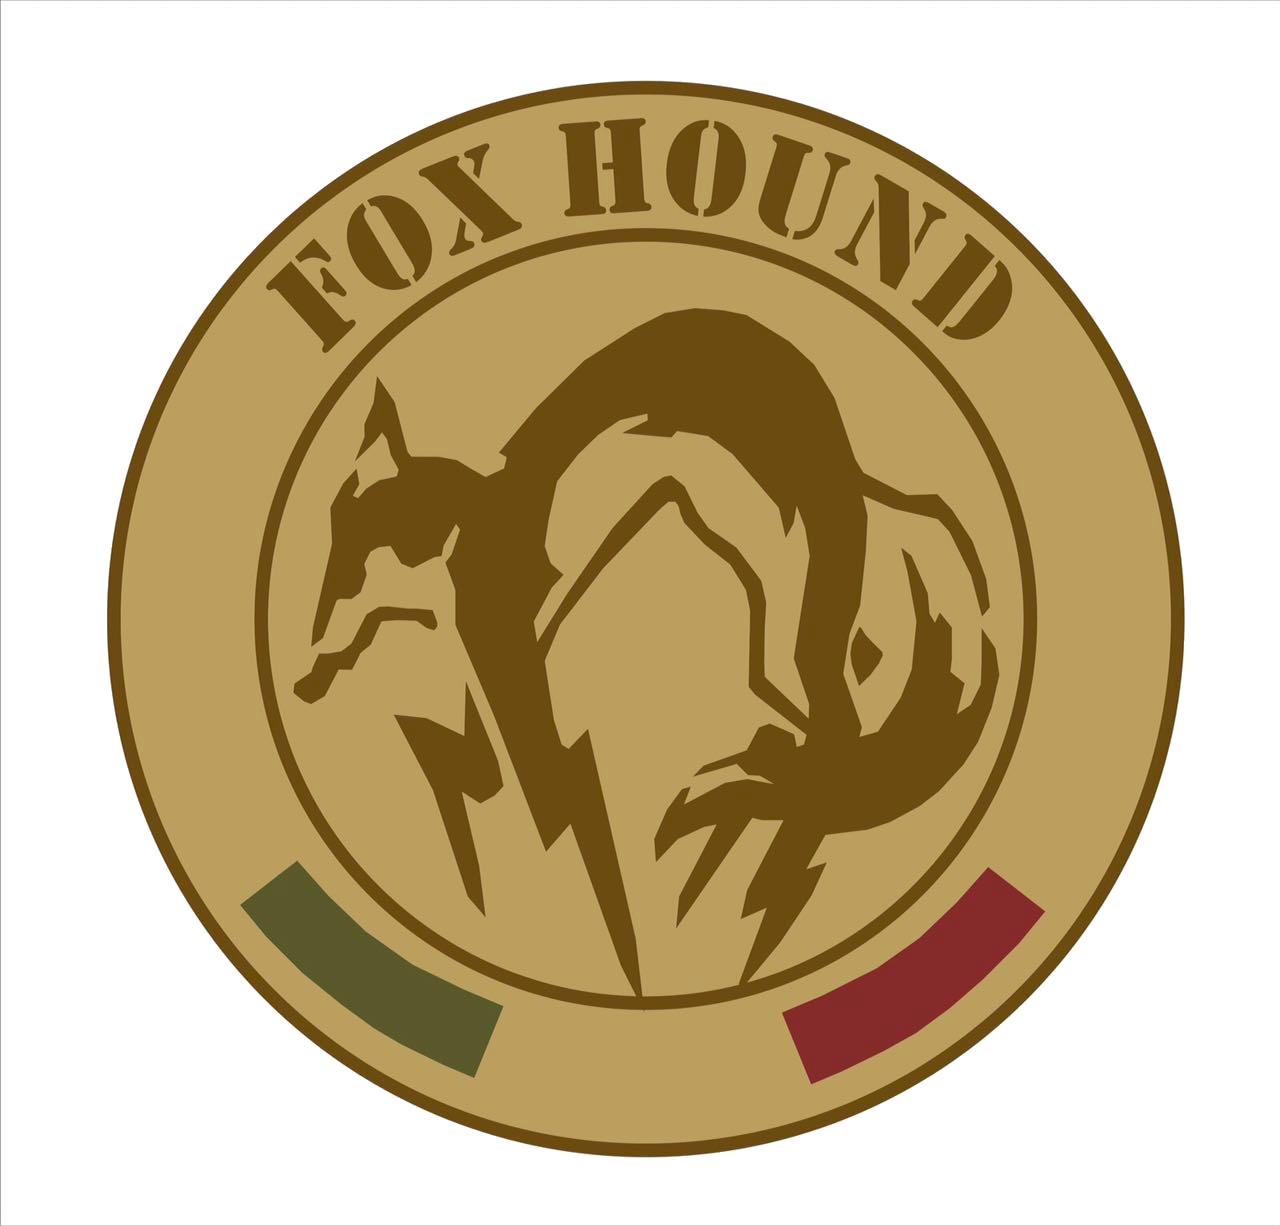 logo_foxhound